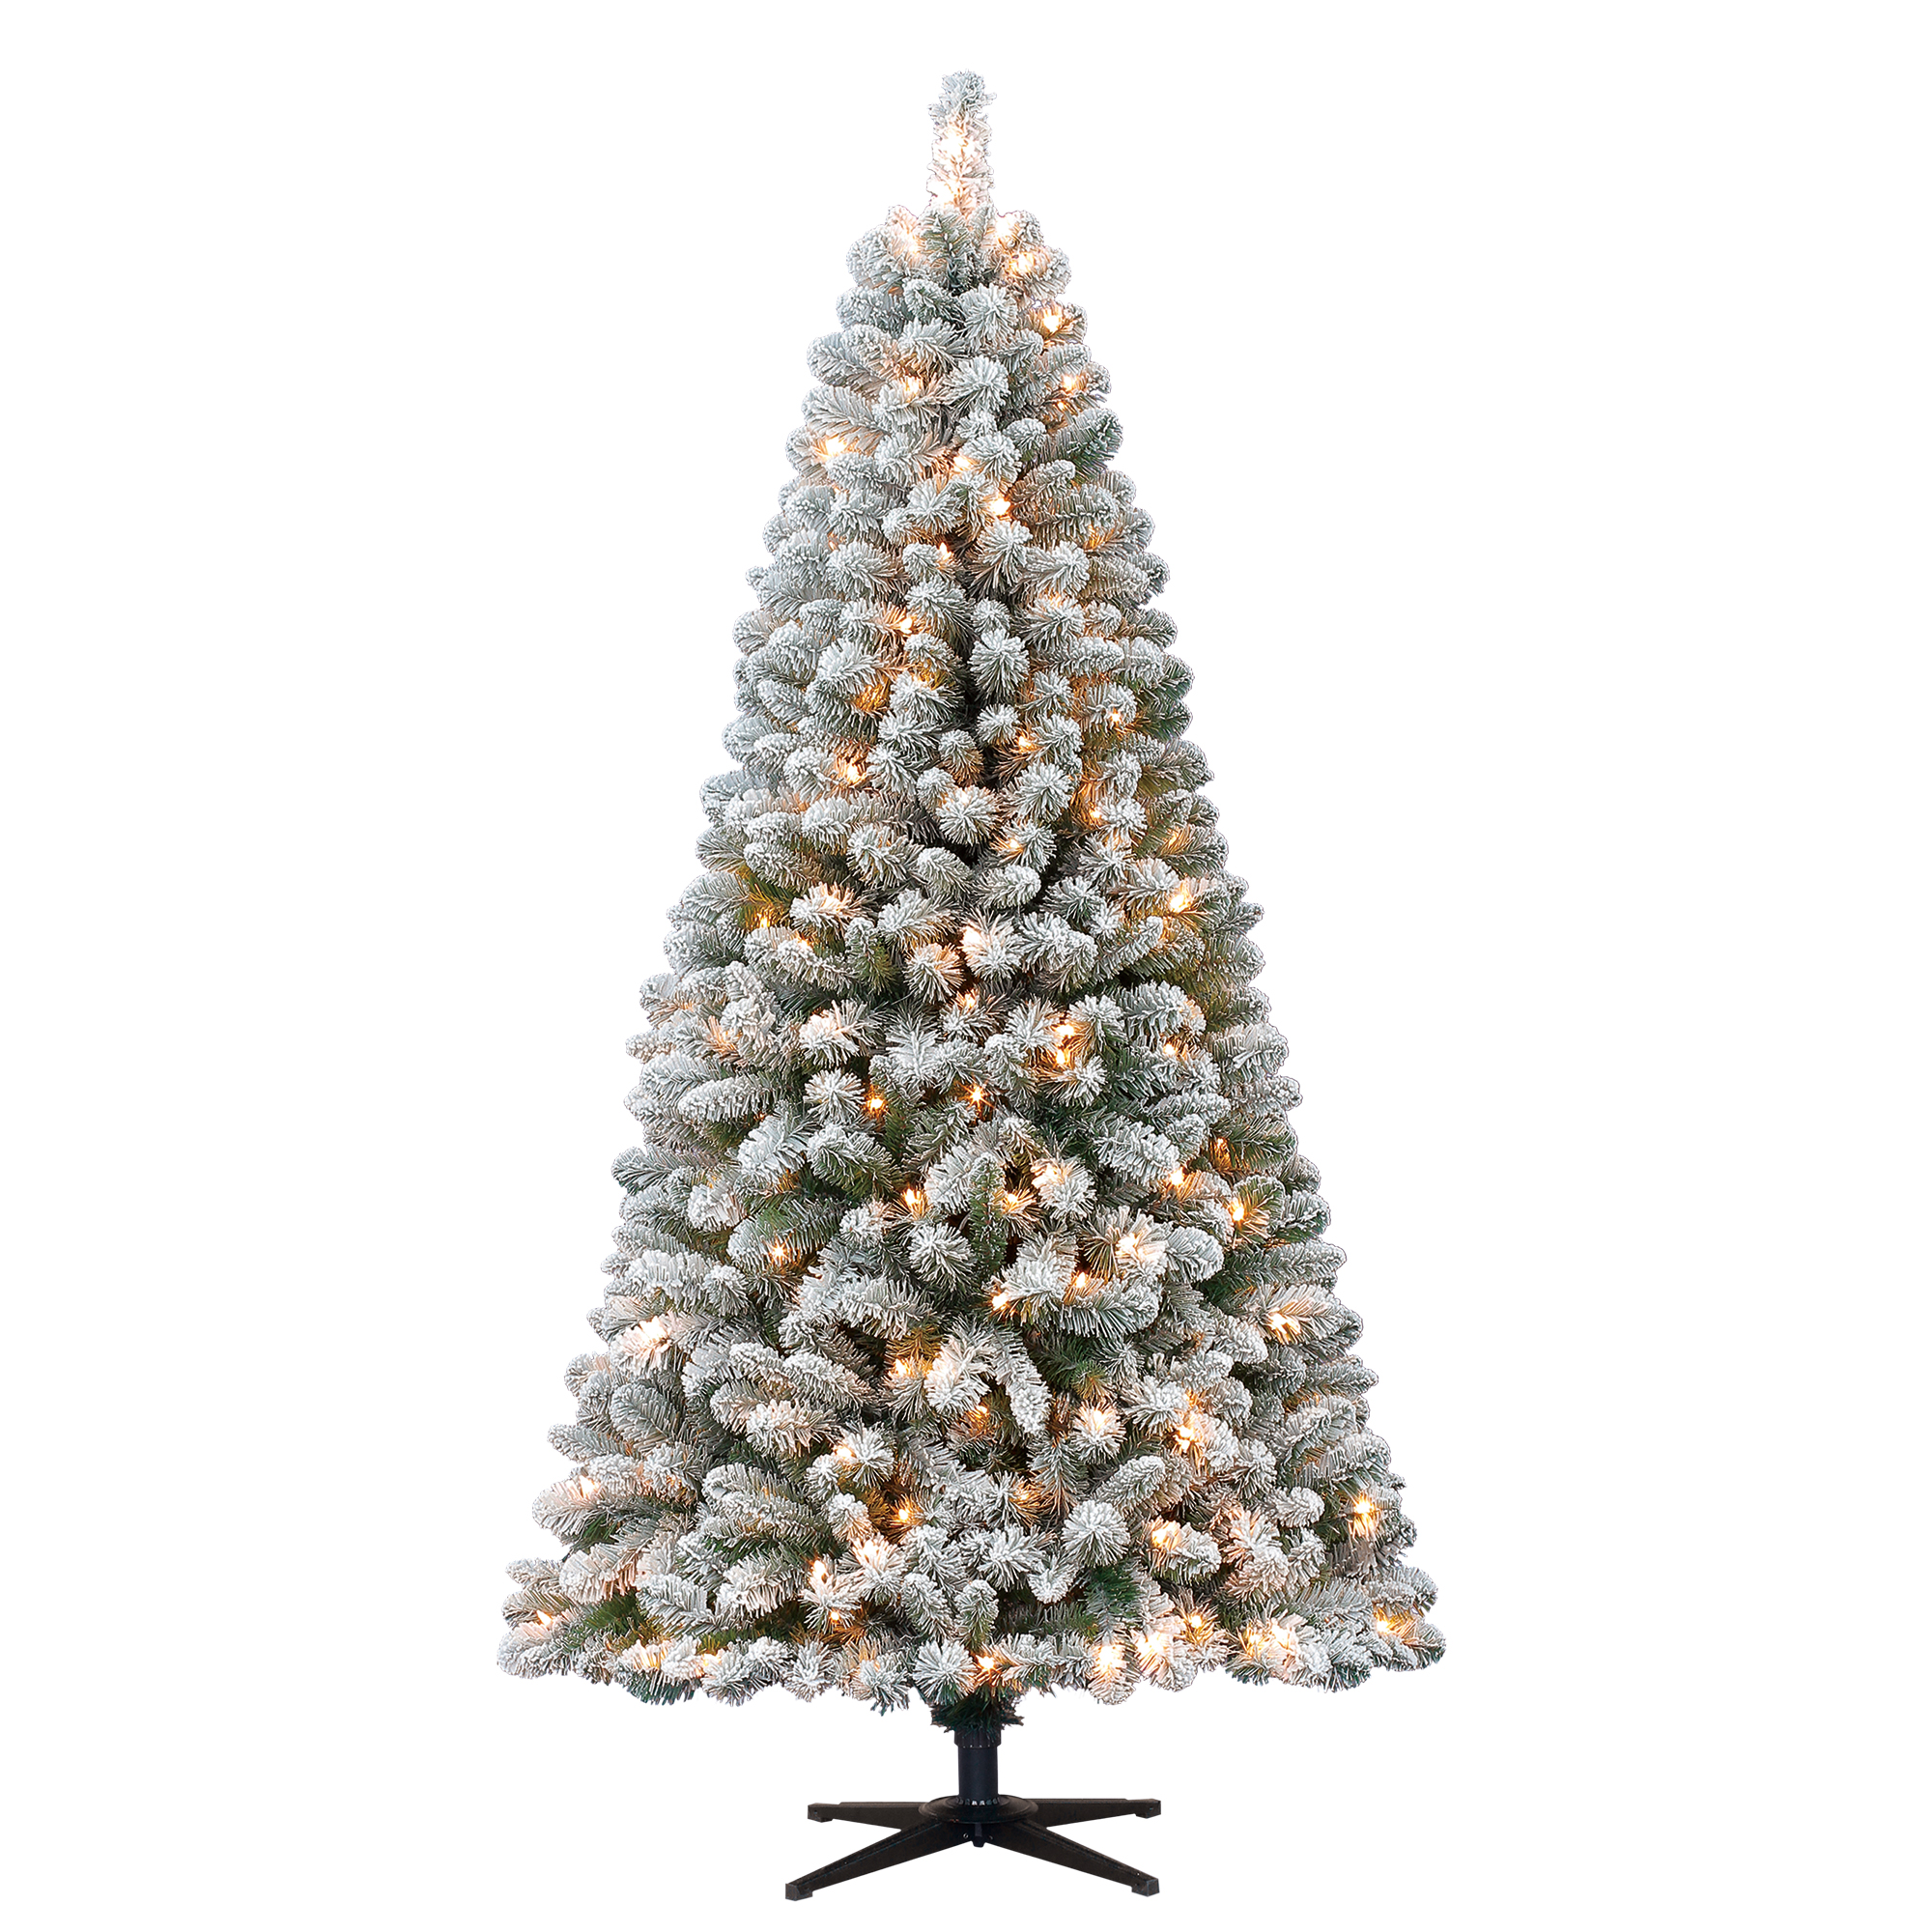 Holiday Time Flocked Pine Christmas Tree 6 5 Ft White On Green Walmart Com Walmart Com